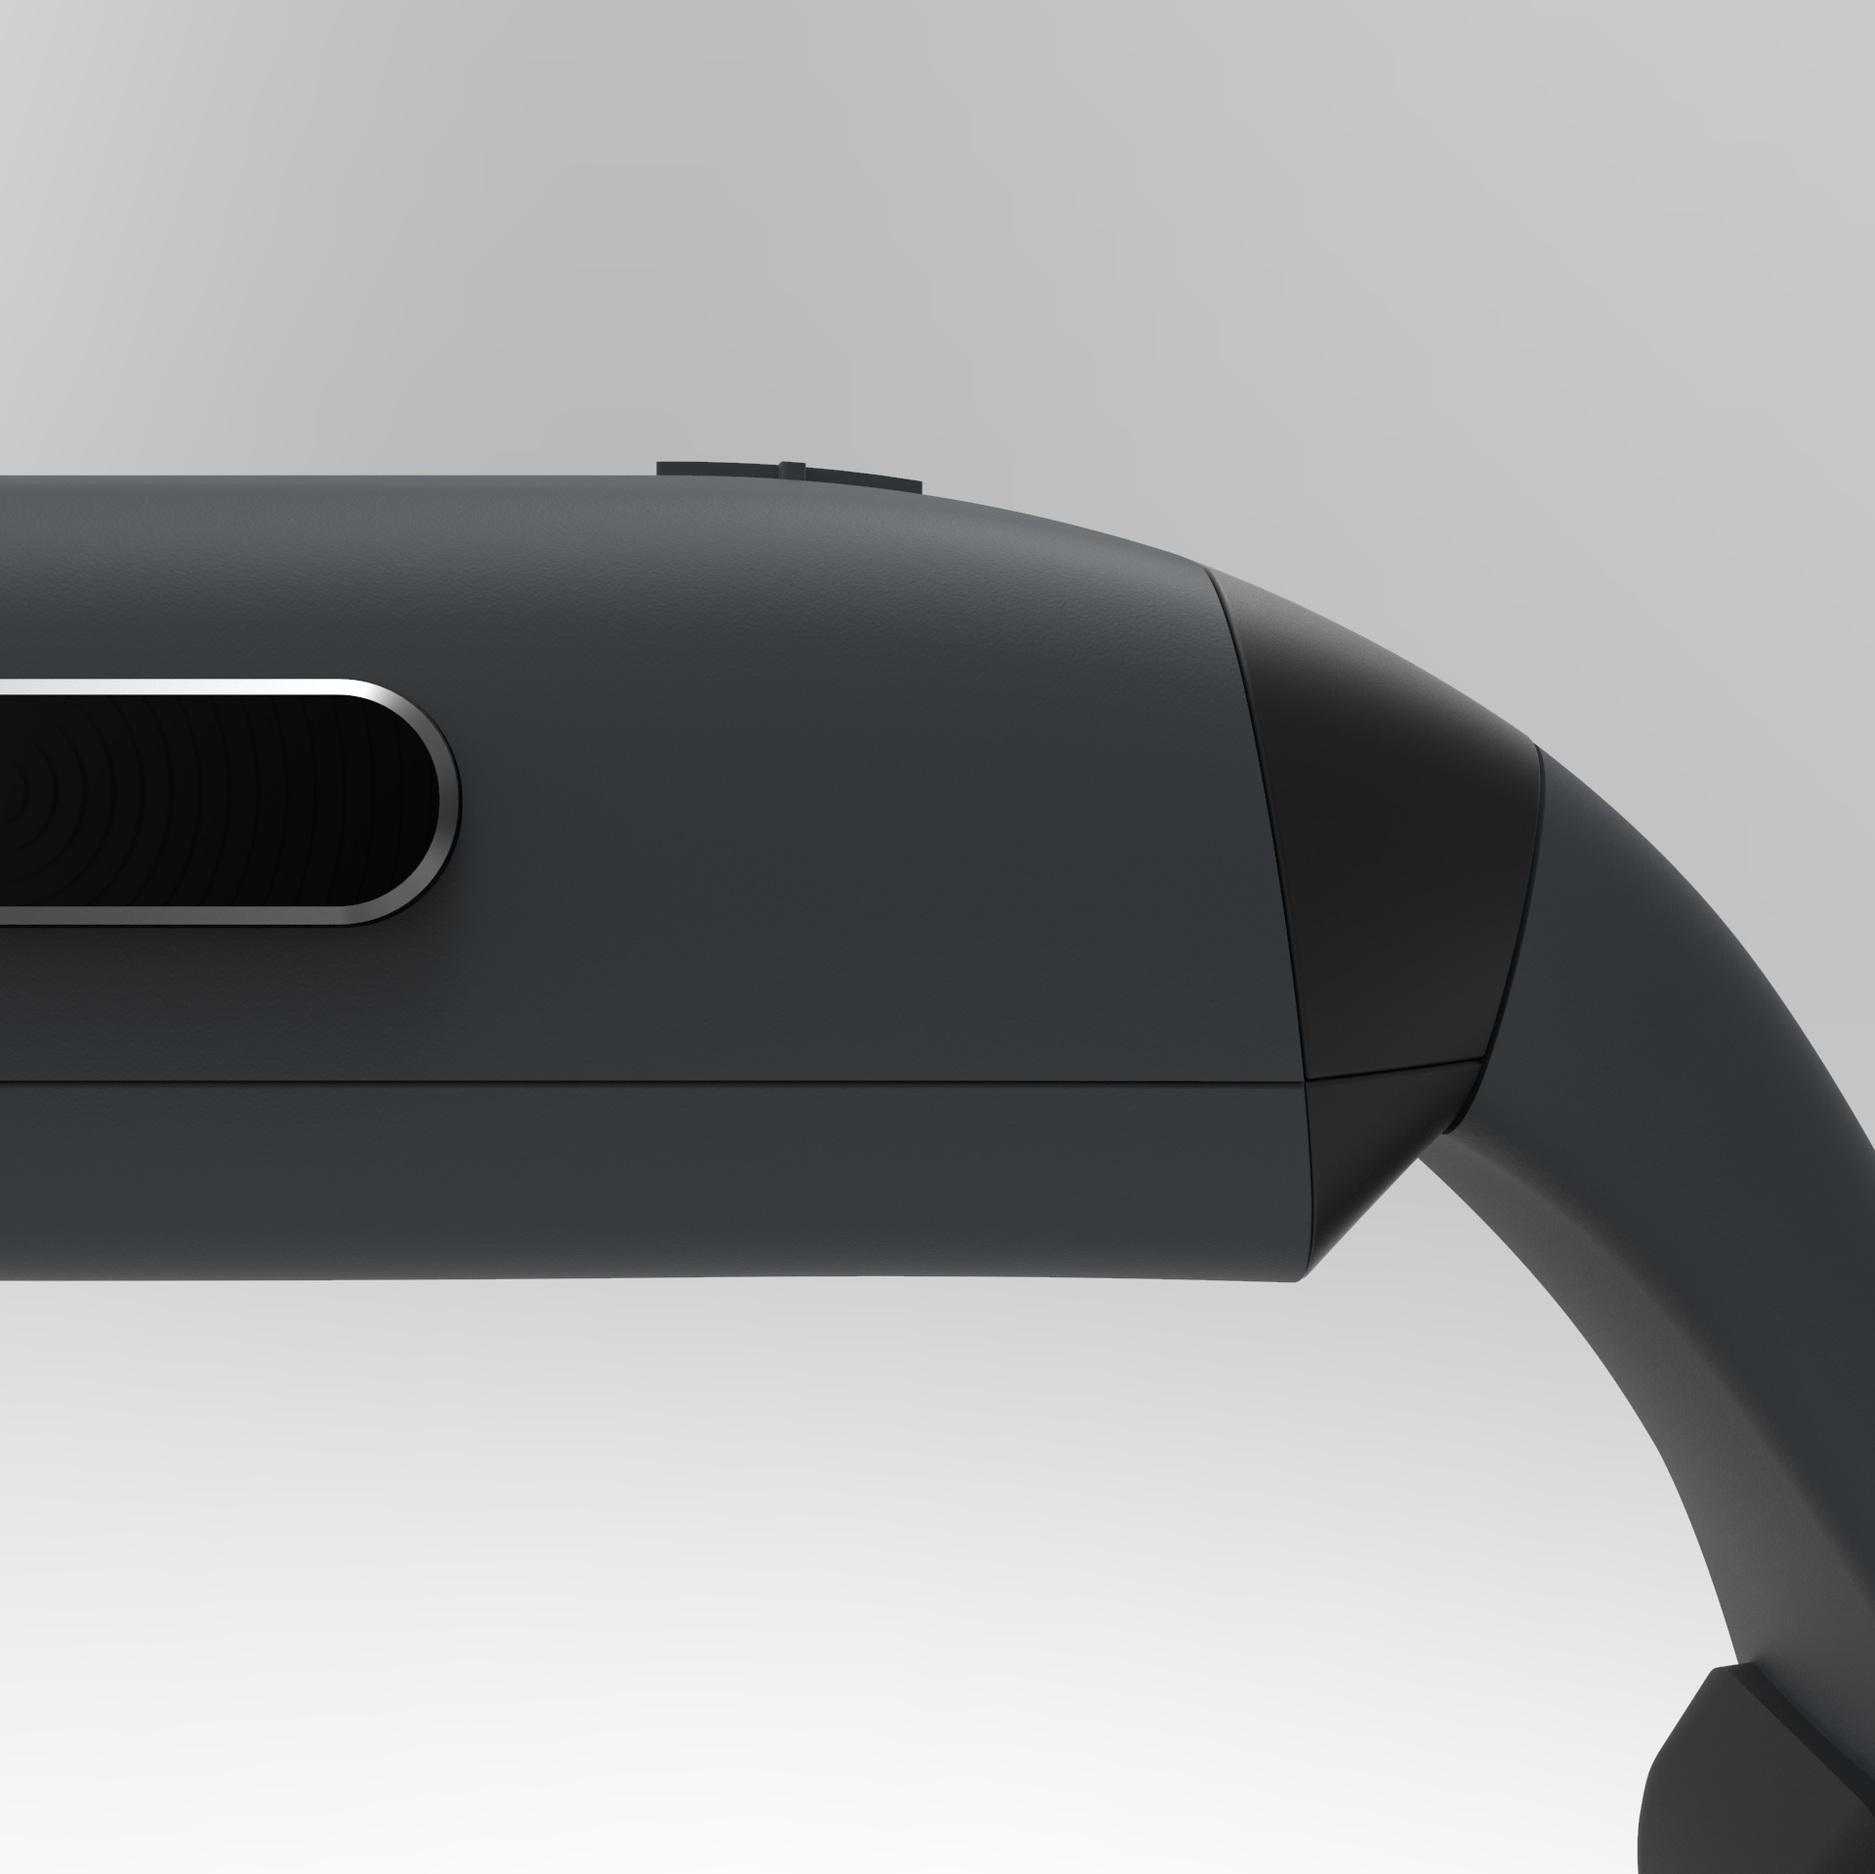 NeoBand (coming soon)